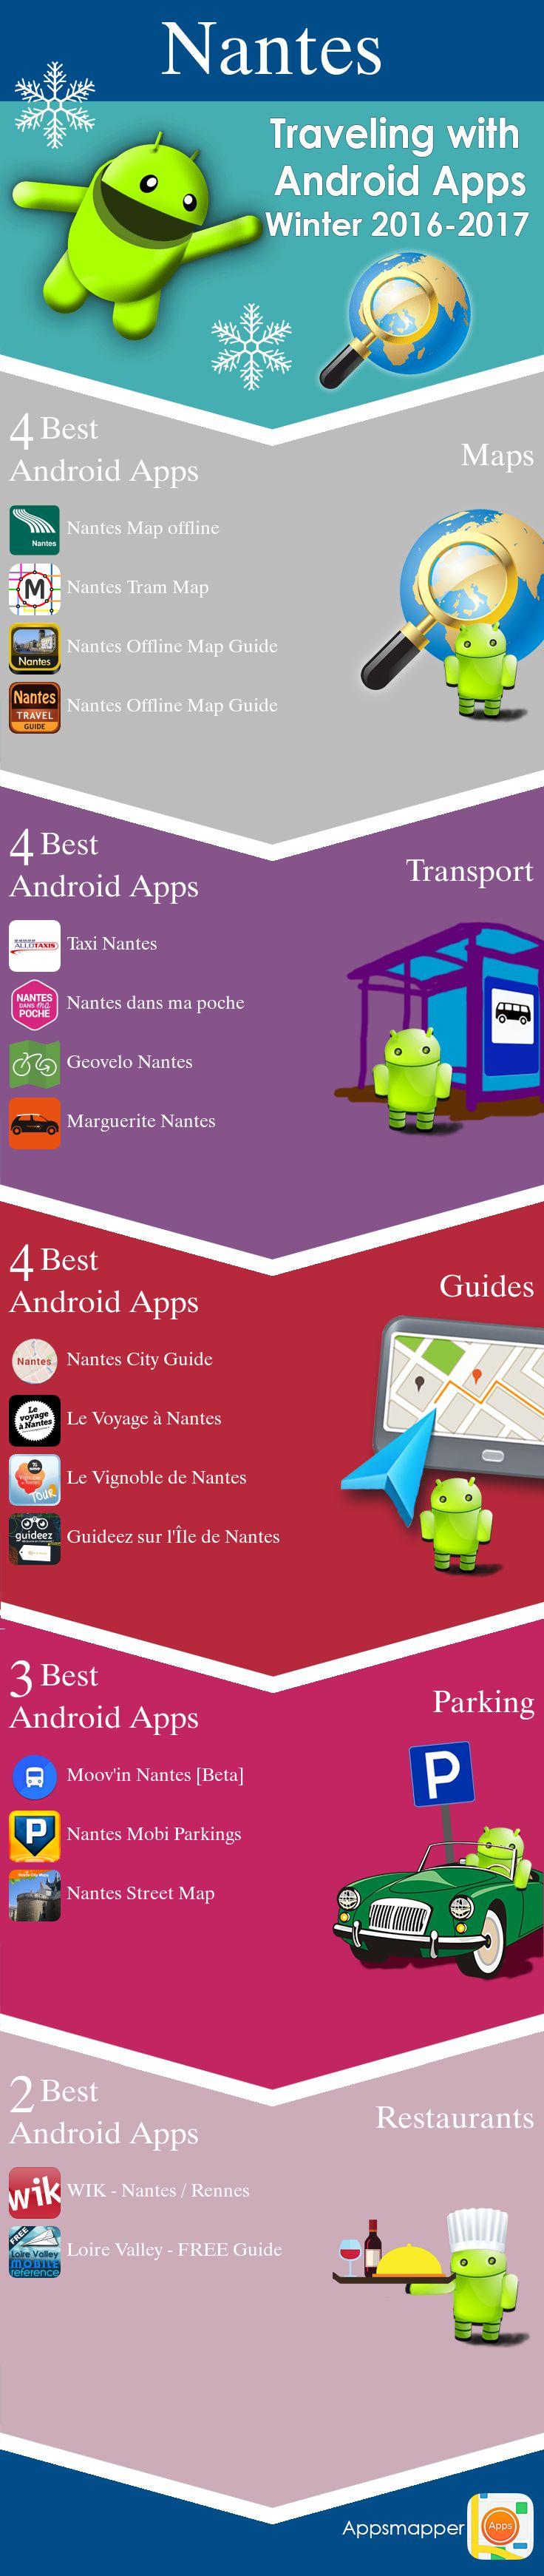 Art color nantes horaires - Nantes Android Apps Travel Guides Maps Transportation Biking Museums Parking